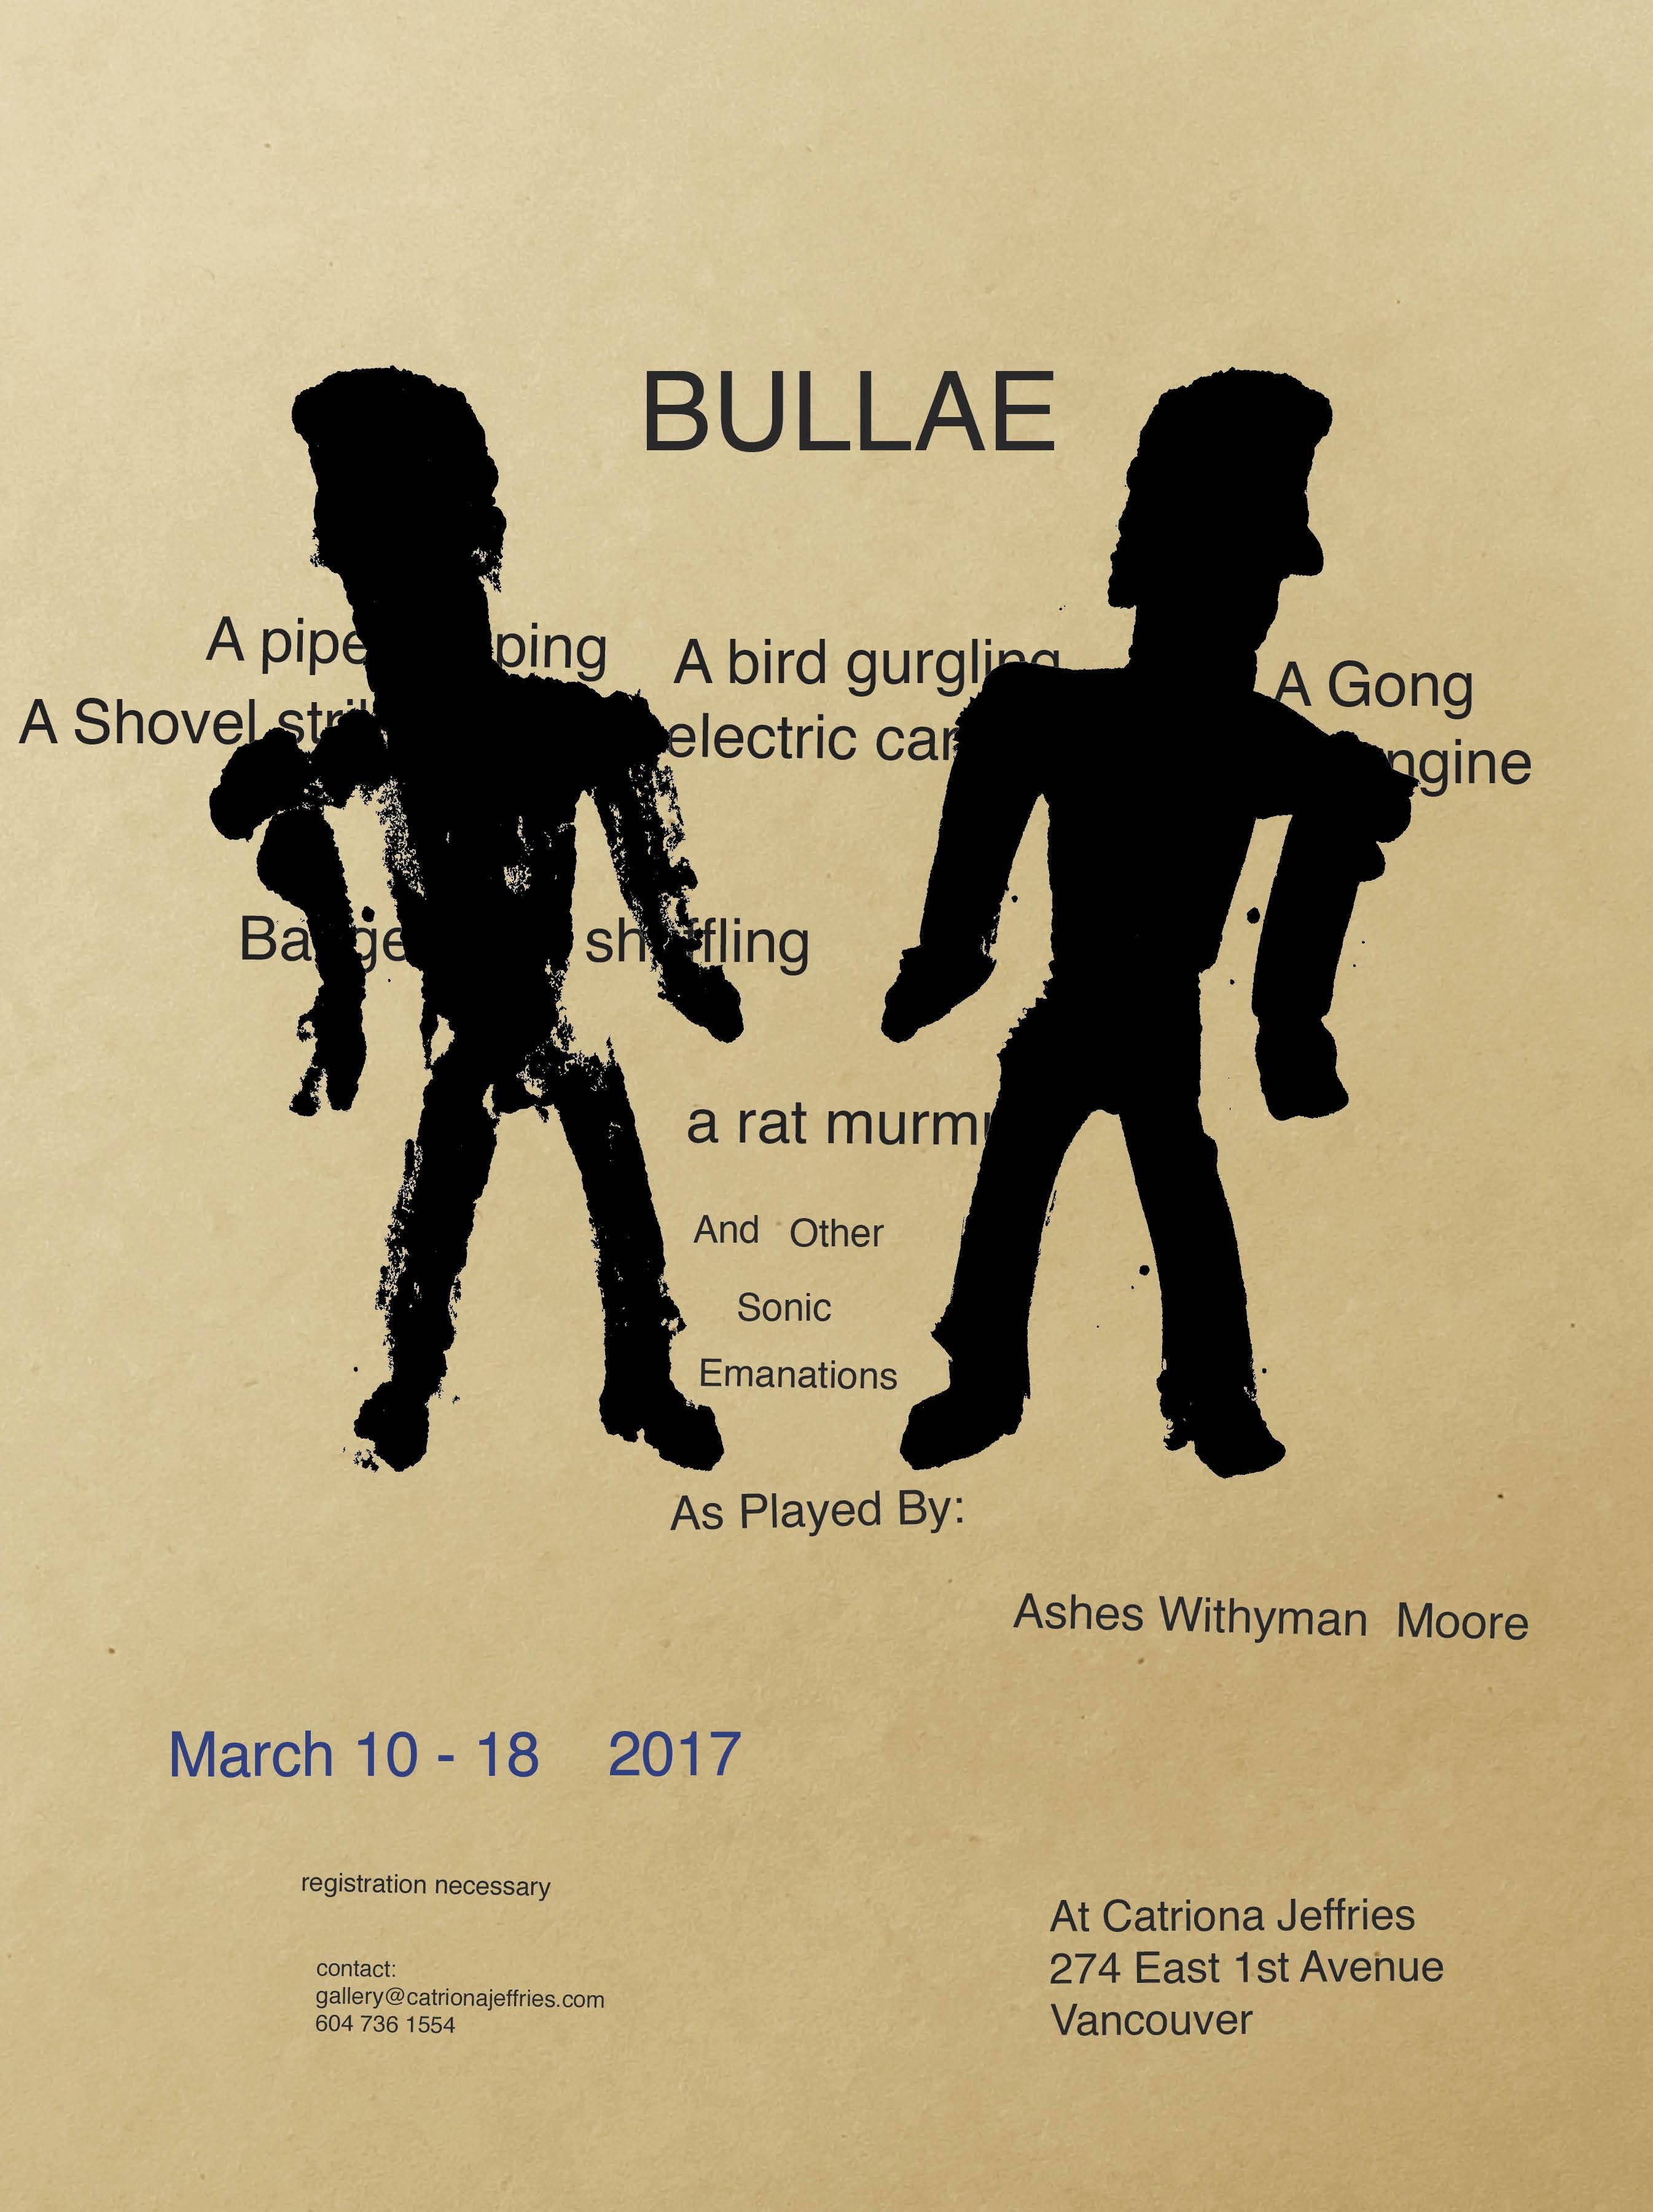 Moore_Bullae_CJG_2017_poster-WEB-VERS.jpg#asset:3851